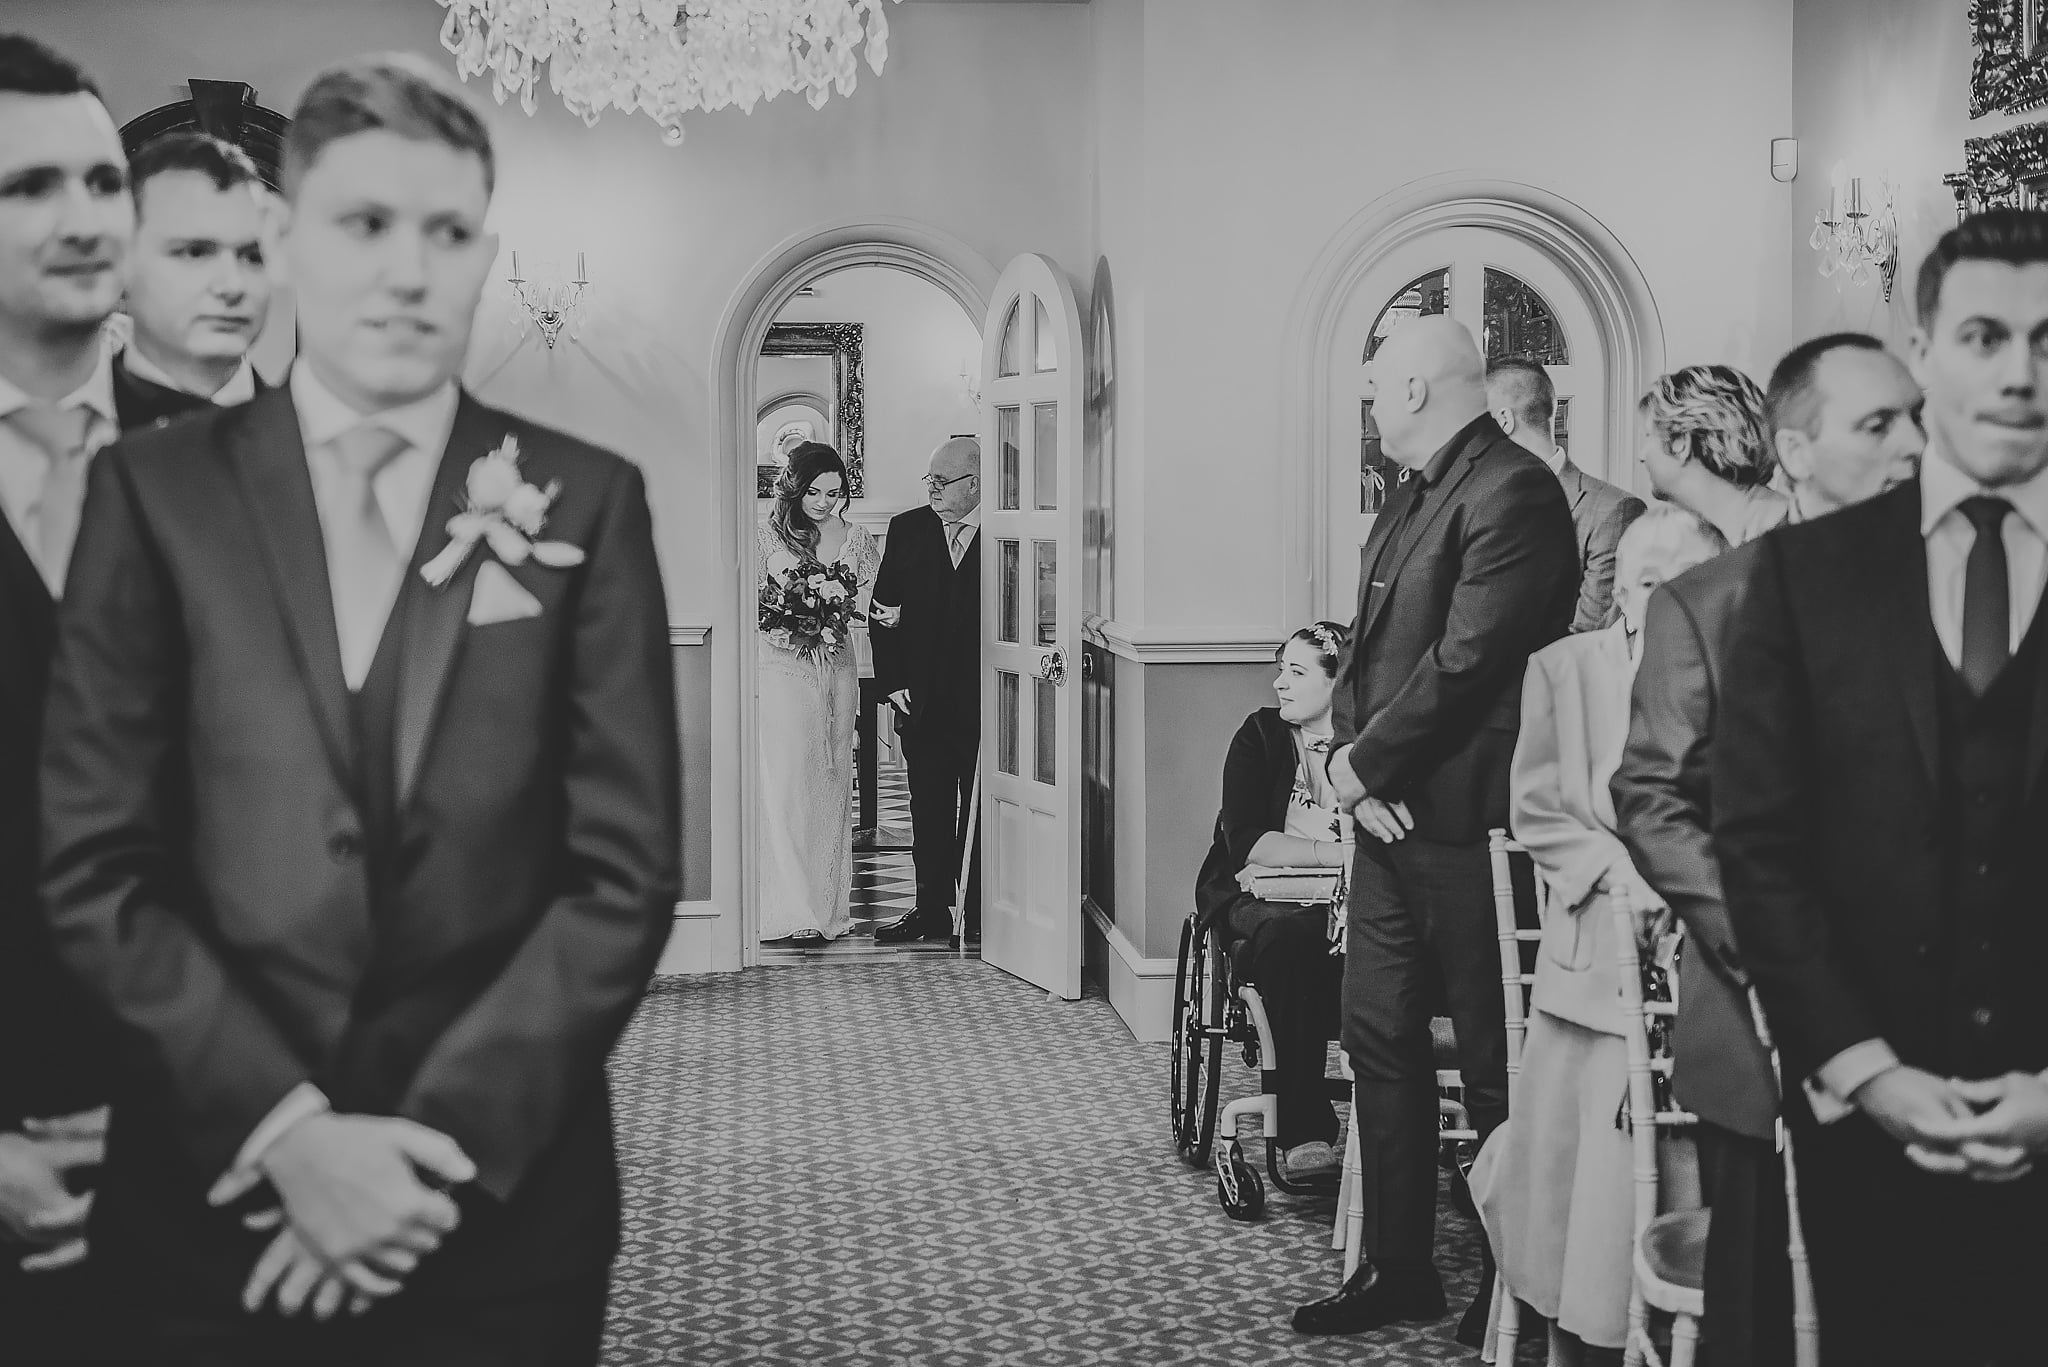 Weston Hall wedding photography, Staffordshire - Sarah + James 1